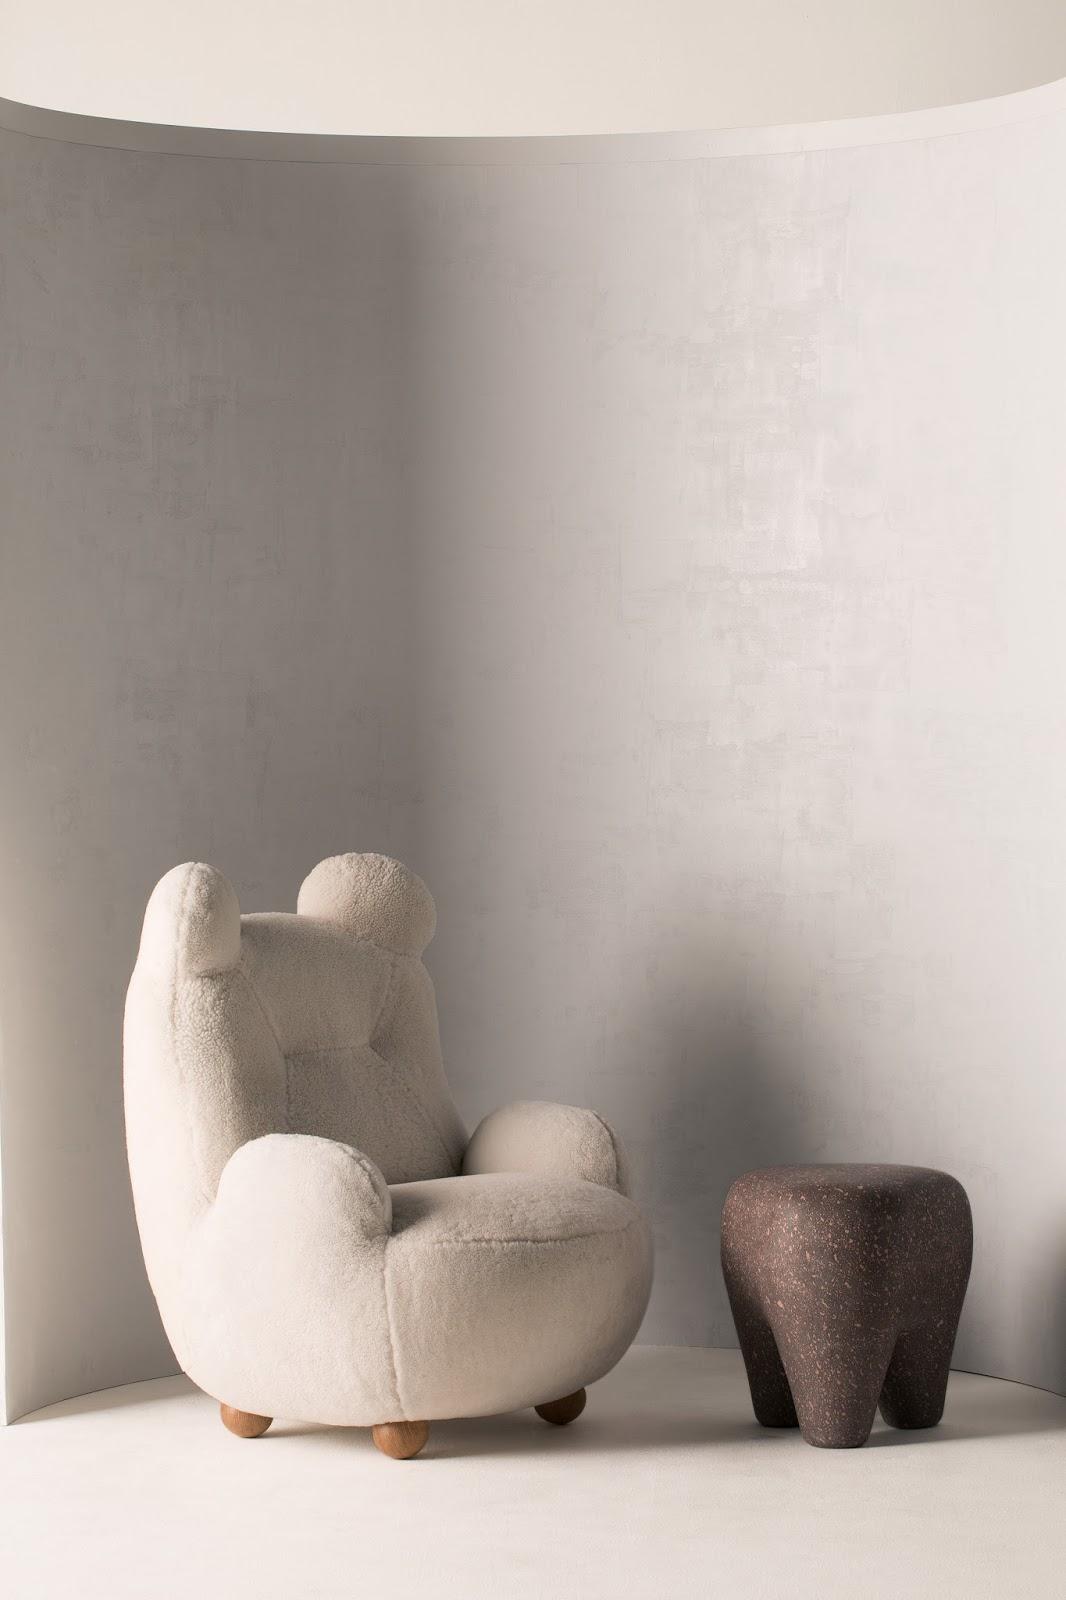 oops pierre yovanovitch bear chair design furniture dezeen 2364 col 8